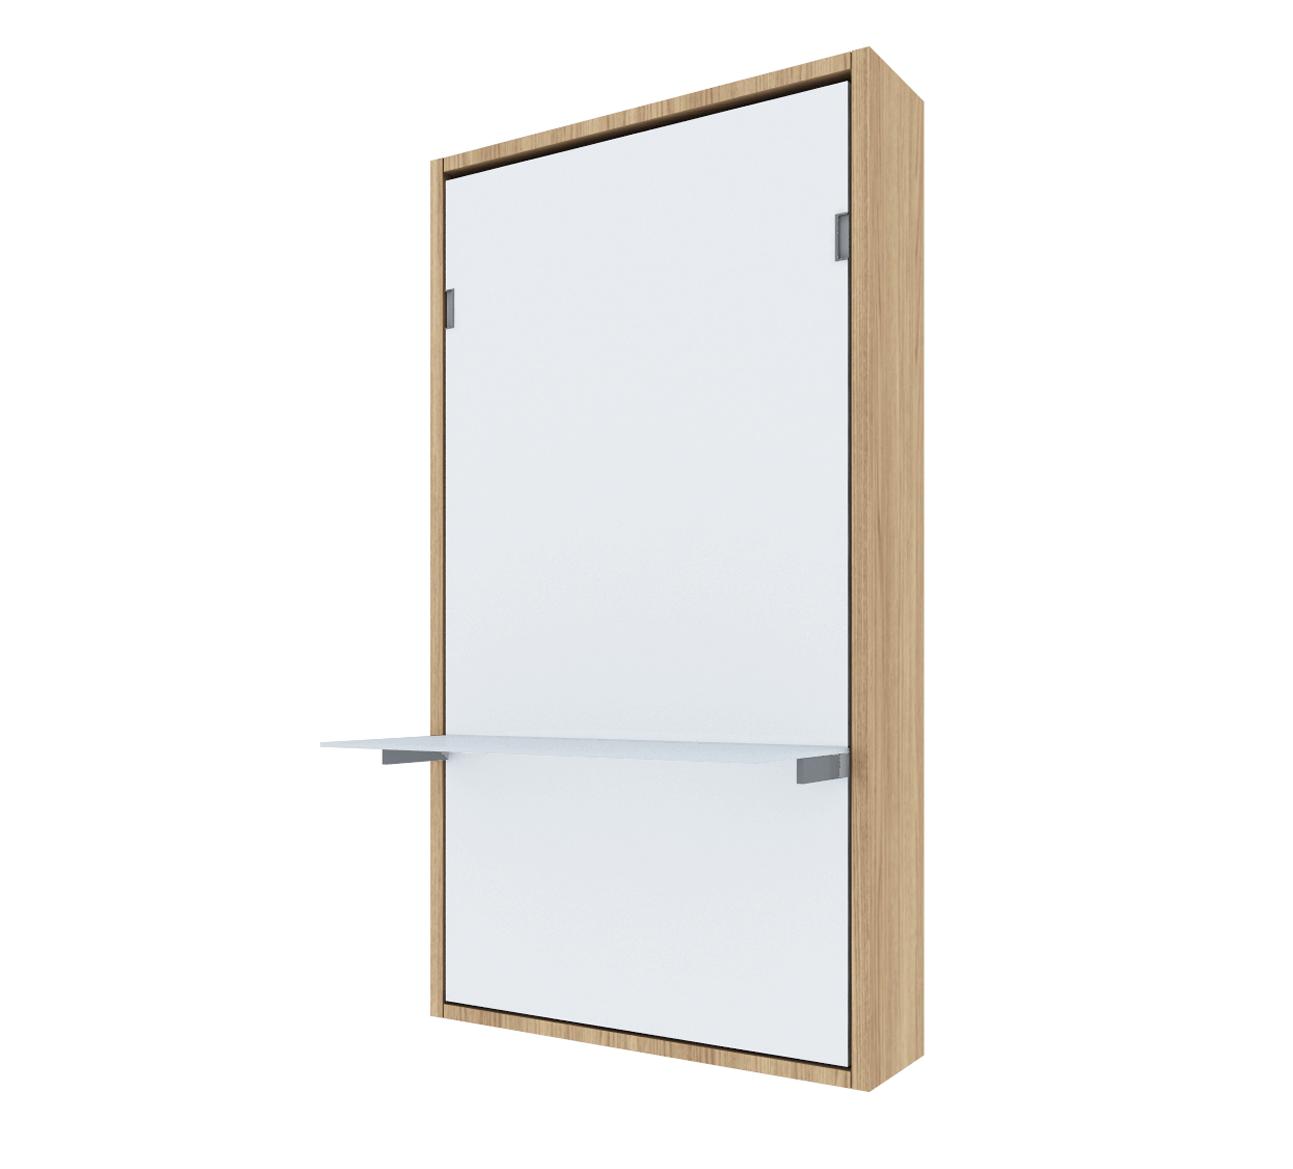 Pat rabatabil vertical cu birou – SmartBed Desk